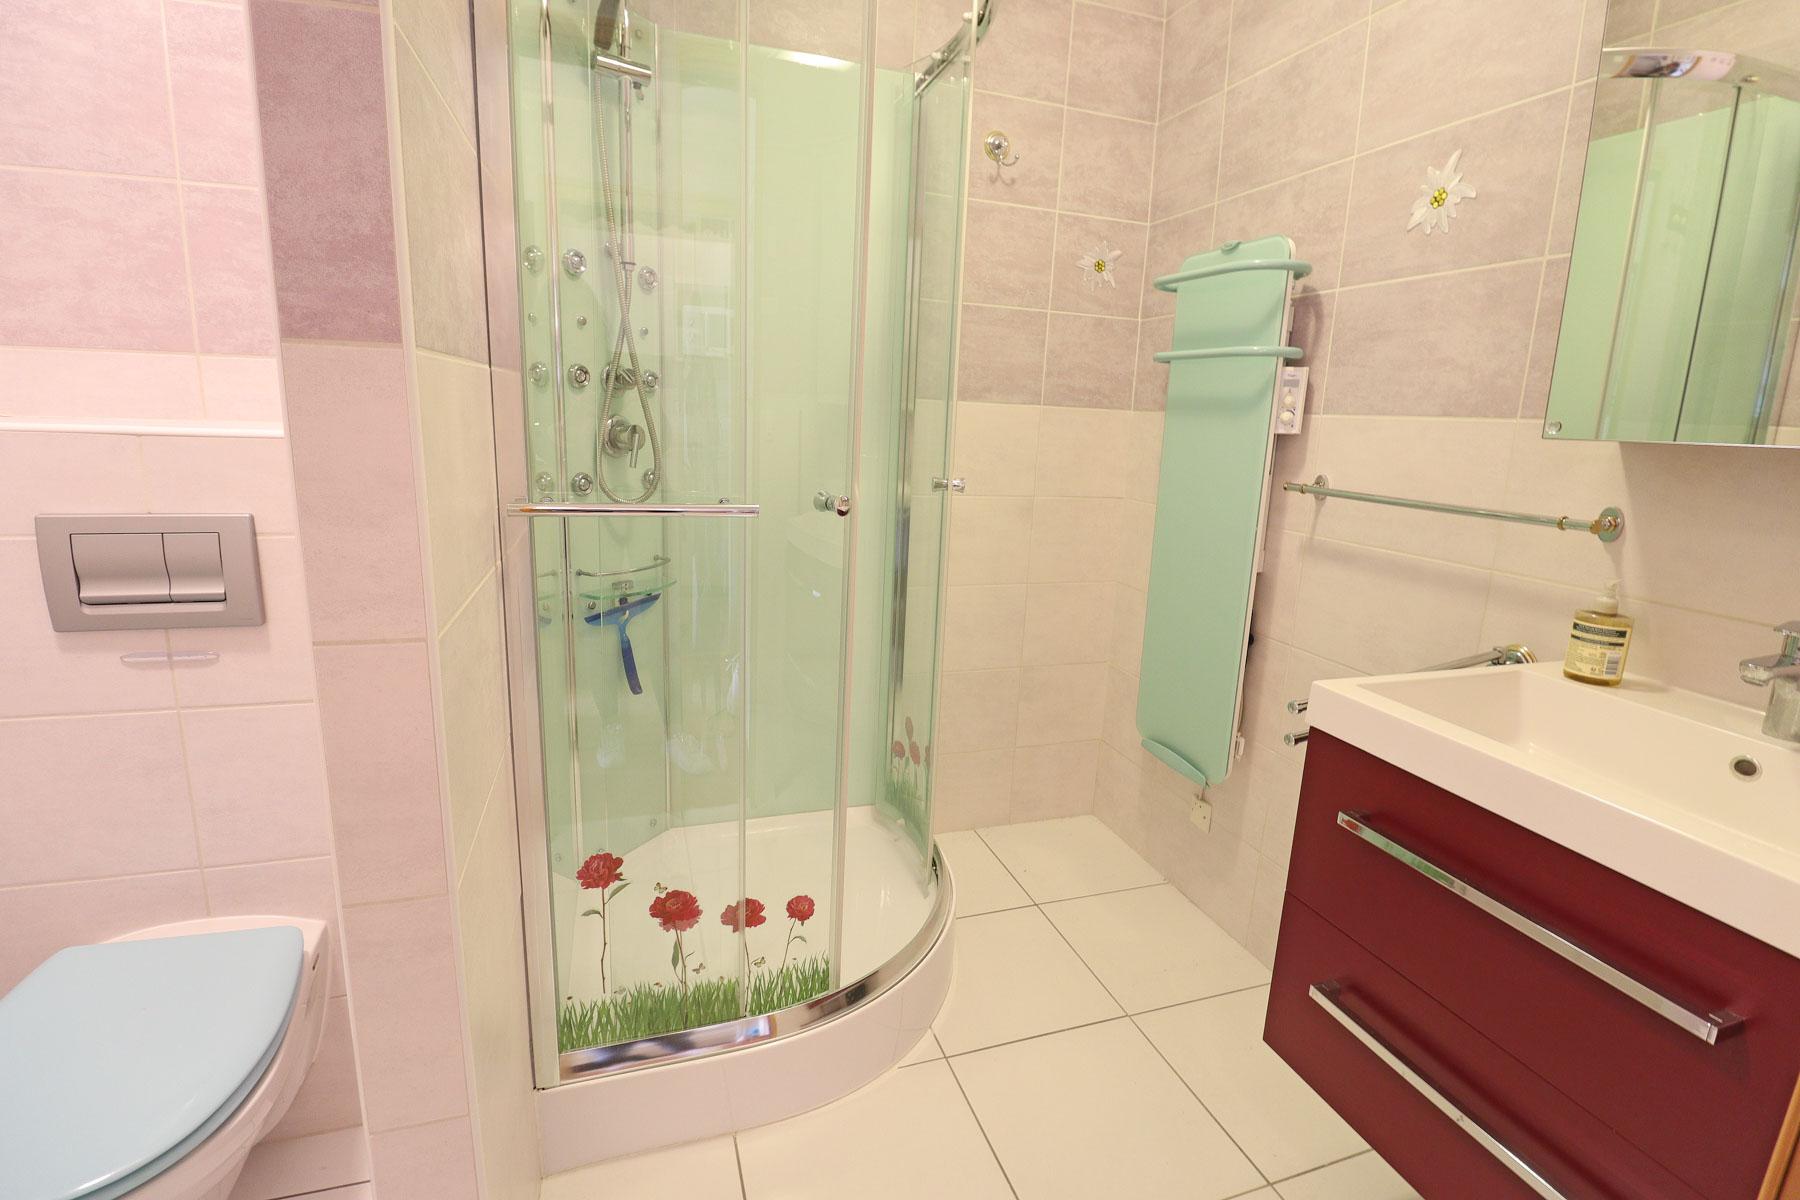 Studio appt 822 Shower Room